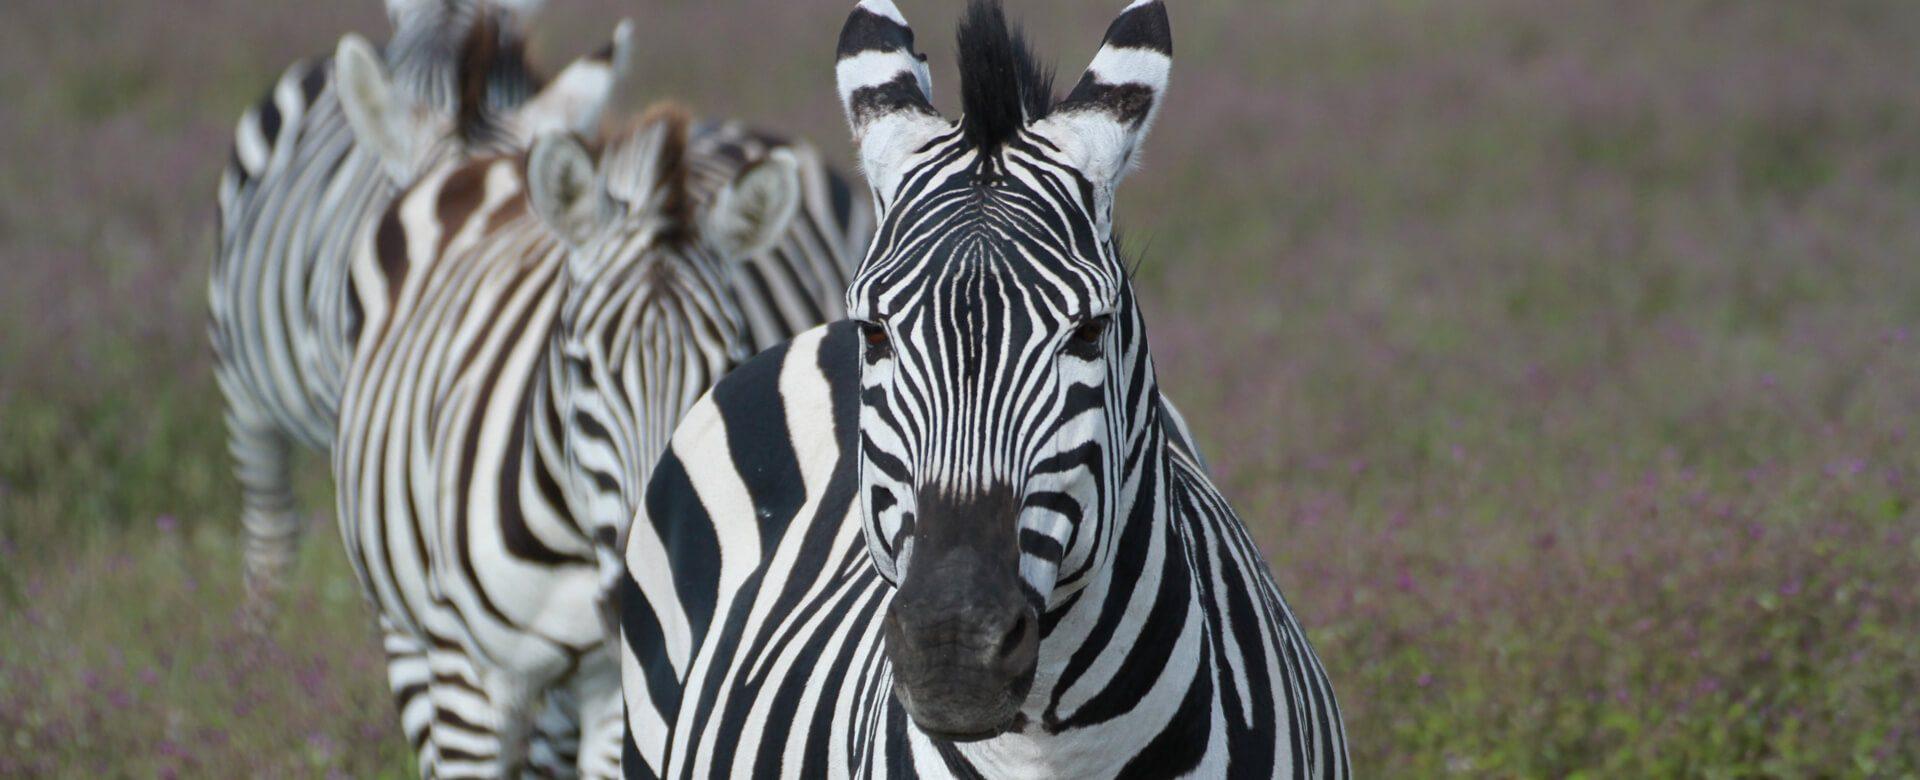 Upepo Safari - Zebras